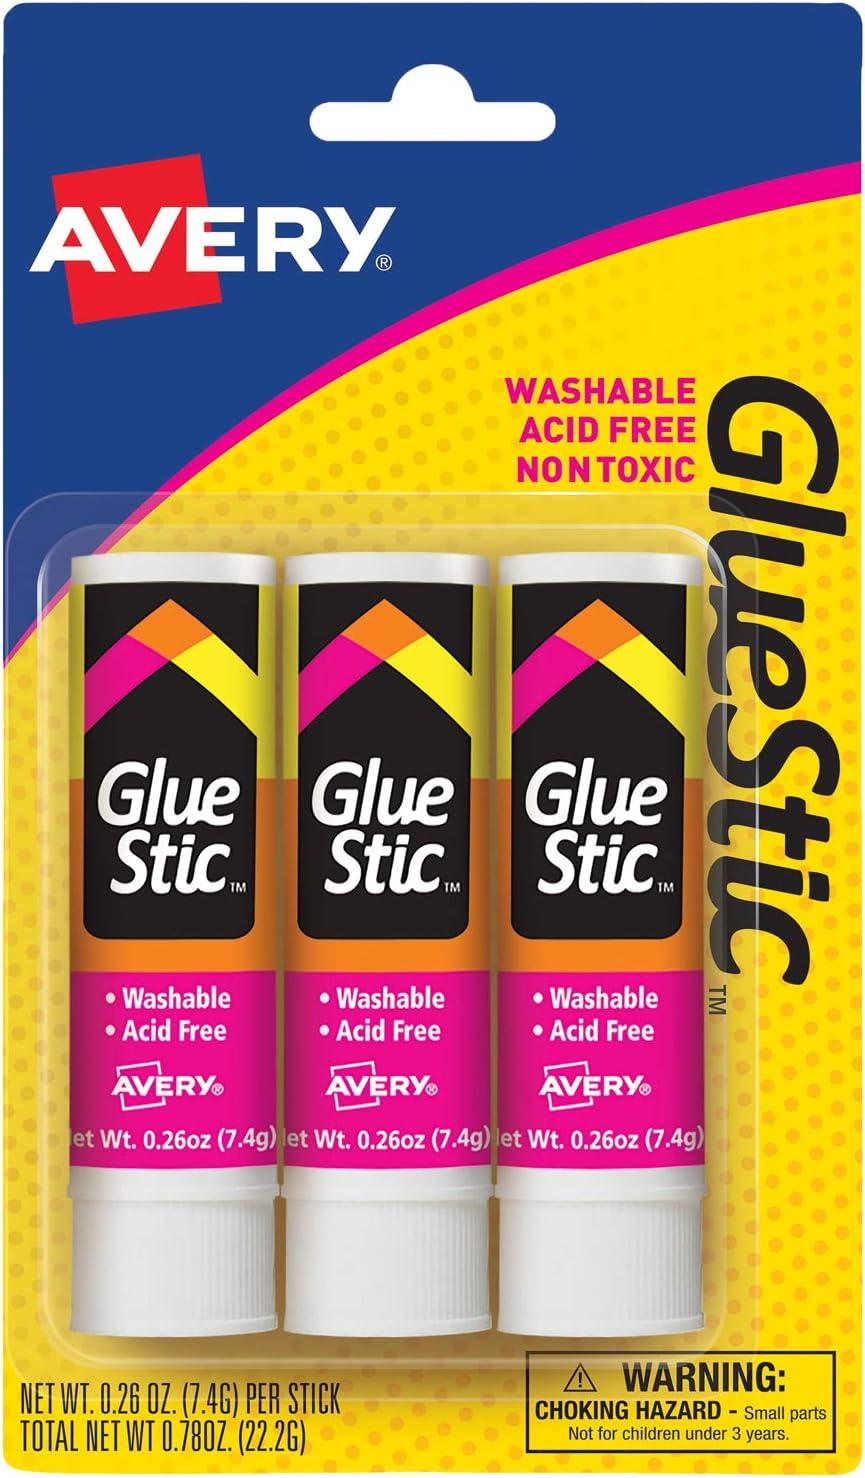 AVERY Glue Stick White, Washable, Nontoxic, 0.26 oz. Permanent Glue Stic, 3pk (00164), Clear